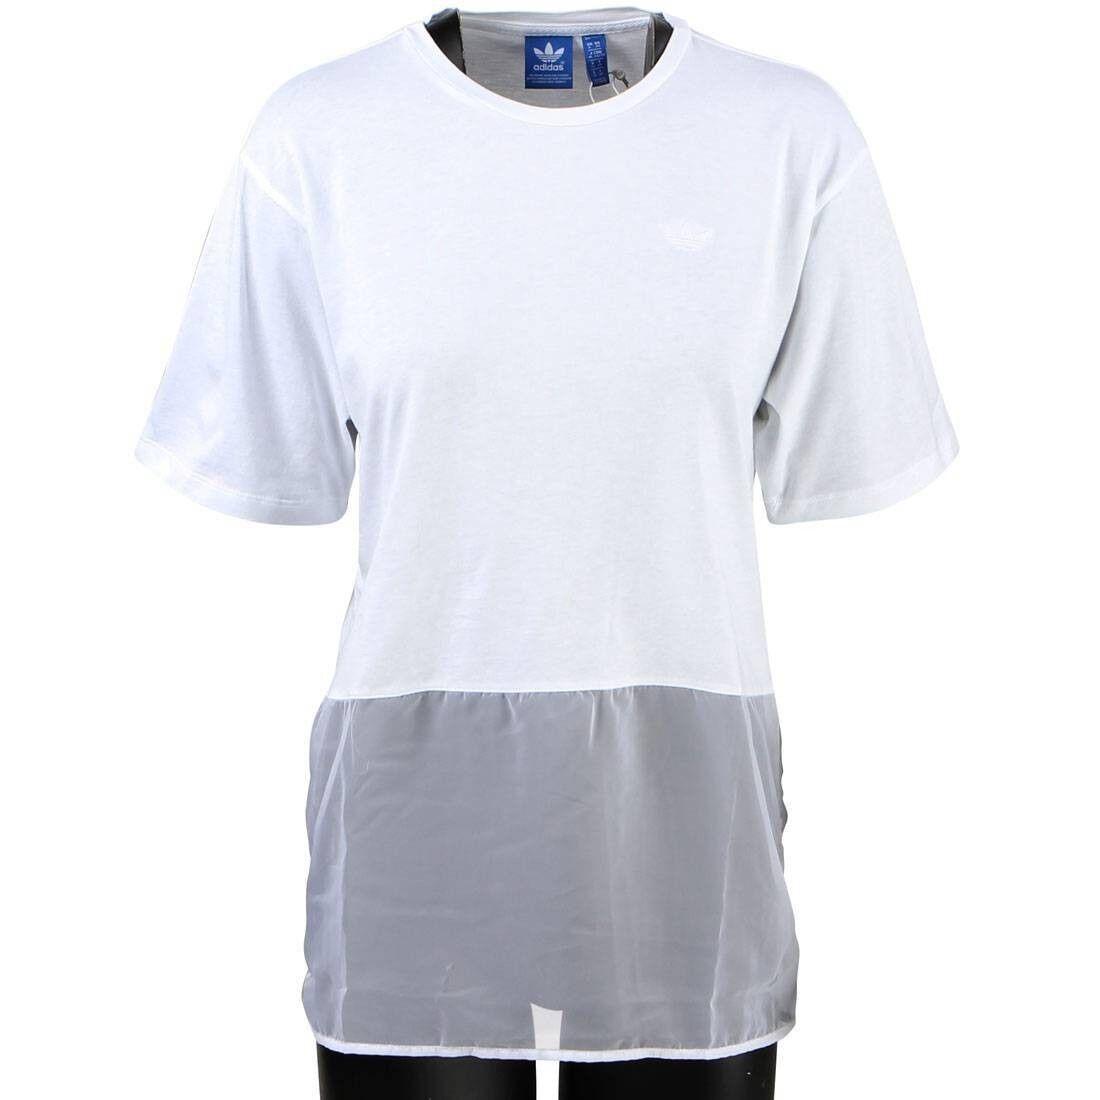 Adidas Women Basketball Tee Dress white